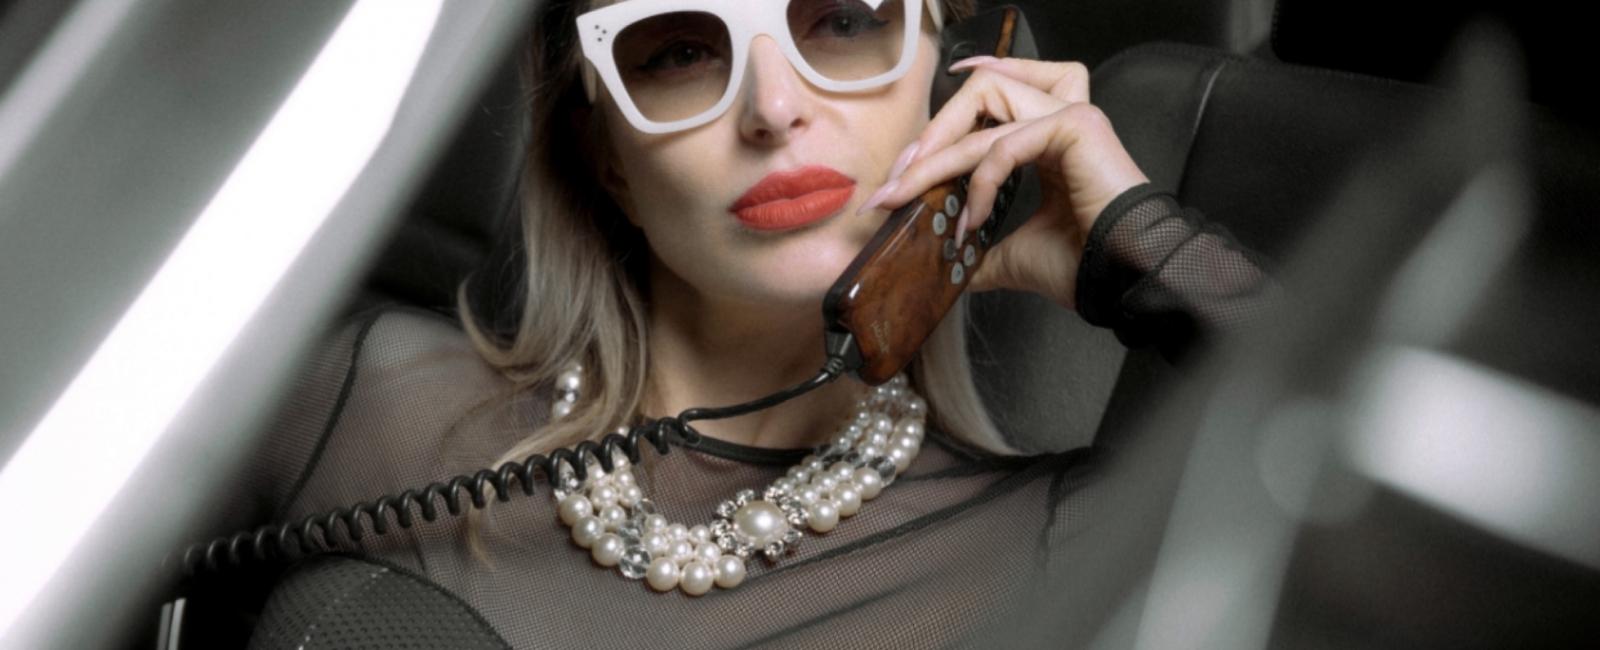 MOD-by-Monique-Fashion-Looks-Editorial-Alessandra-Rich-Swimwear